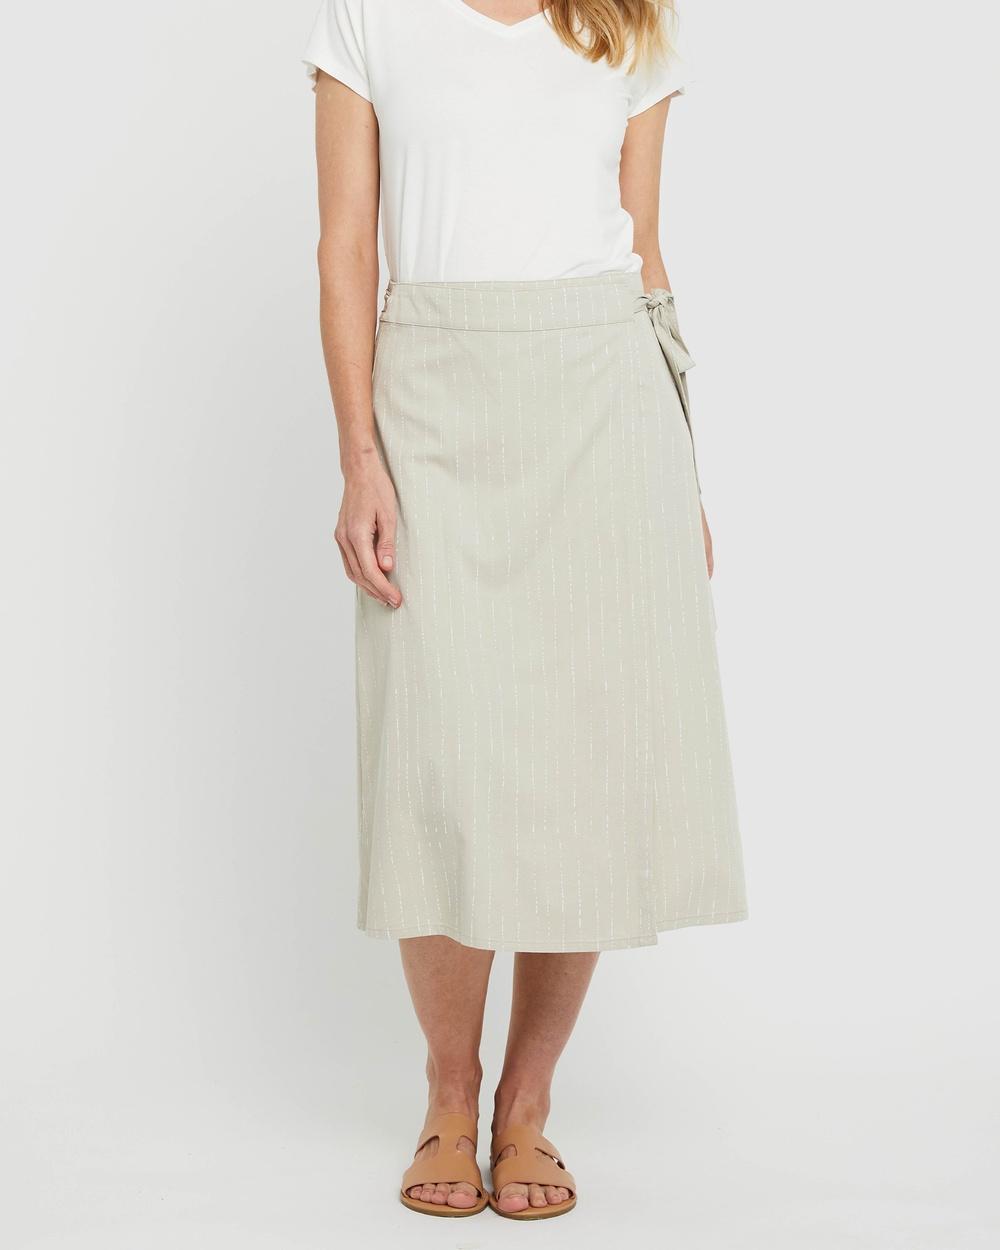 Bamboo Body Woven Wrap Skirt Skirts Organic Pinstripe